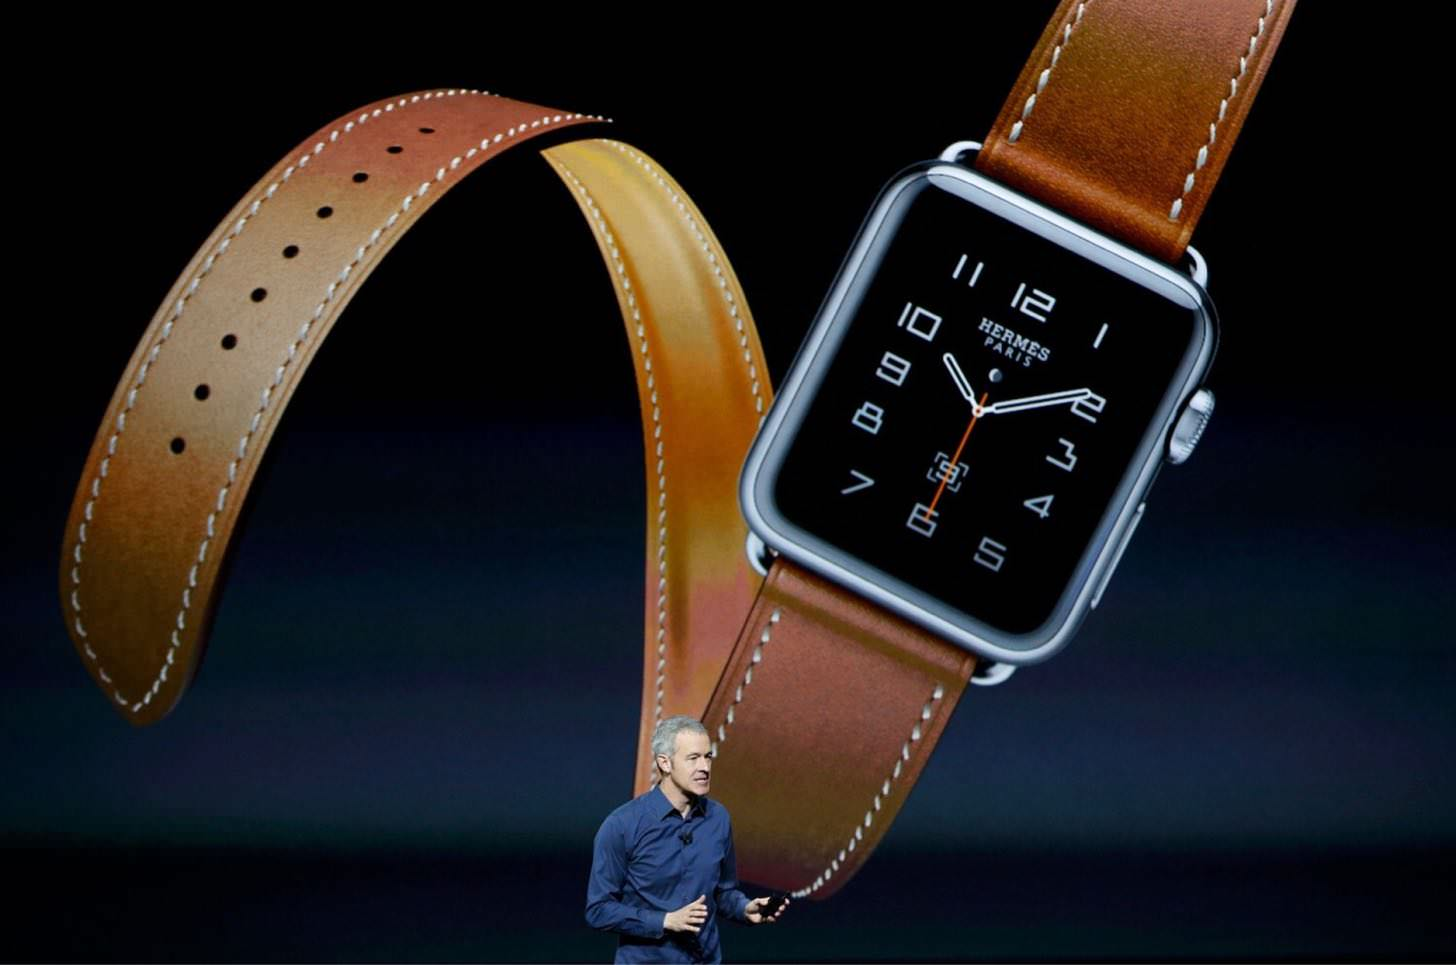 【Apple Watch】watchOS 2.2は2016年3月登場か?